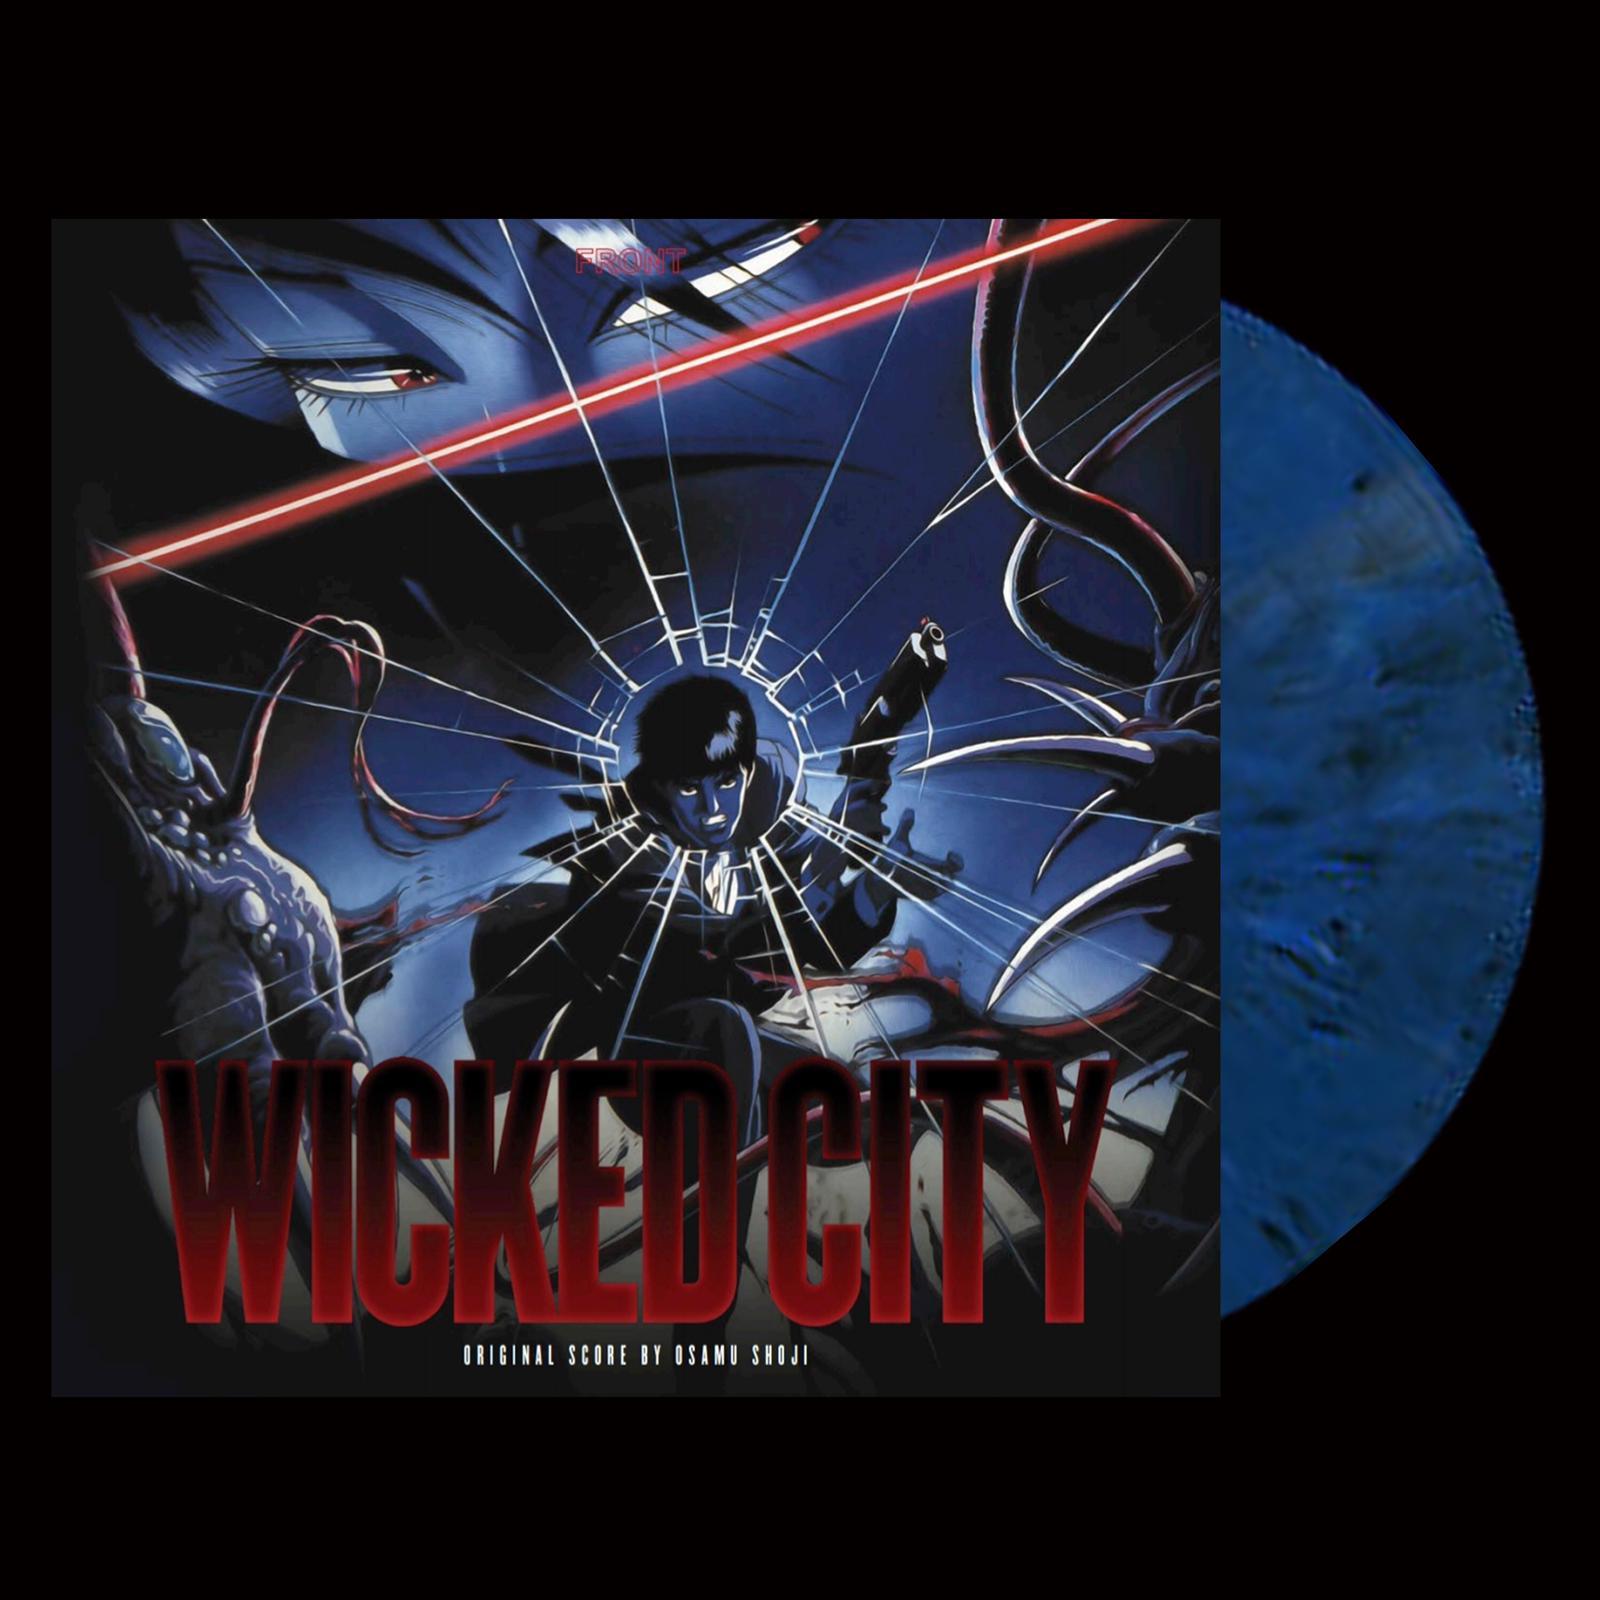 Wicked City (Original 1987 Anime Soundtrack)